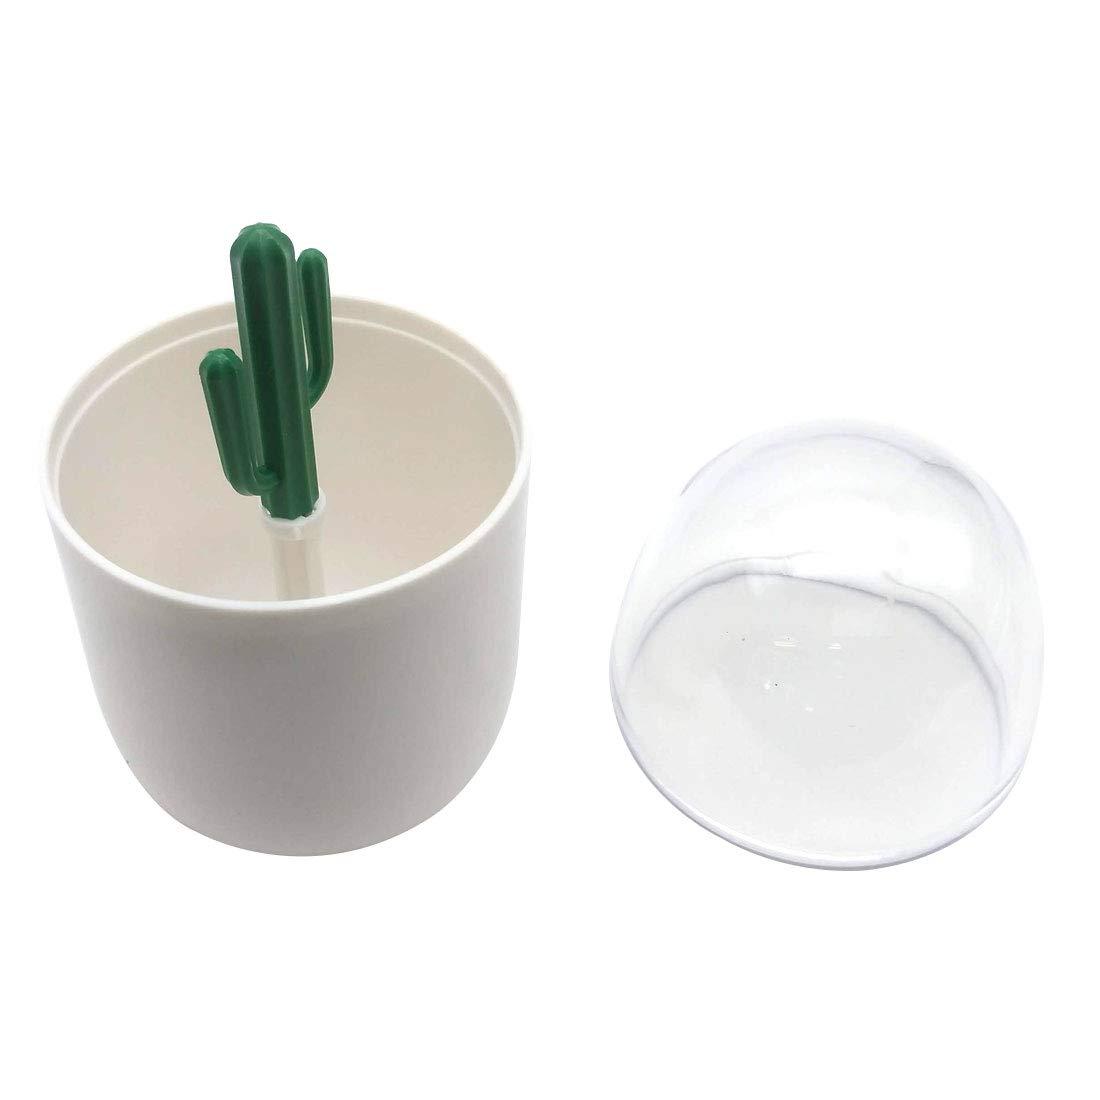 Table Decorate Transparent Plant//animal Toothpick Storage Boxs Cotton Swab Box Dust toothpick Box Storage Tank Cactus